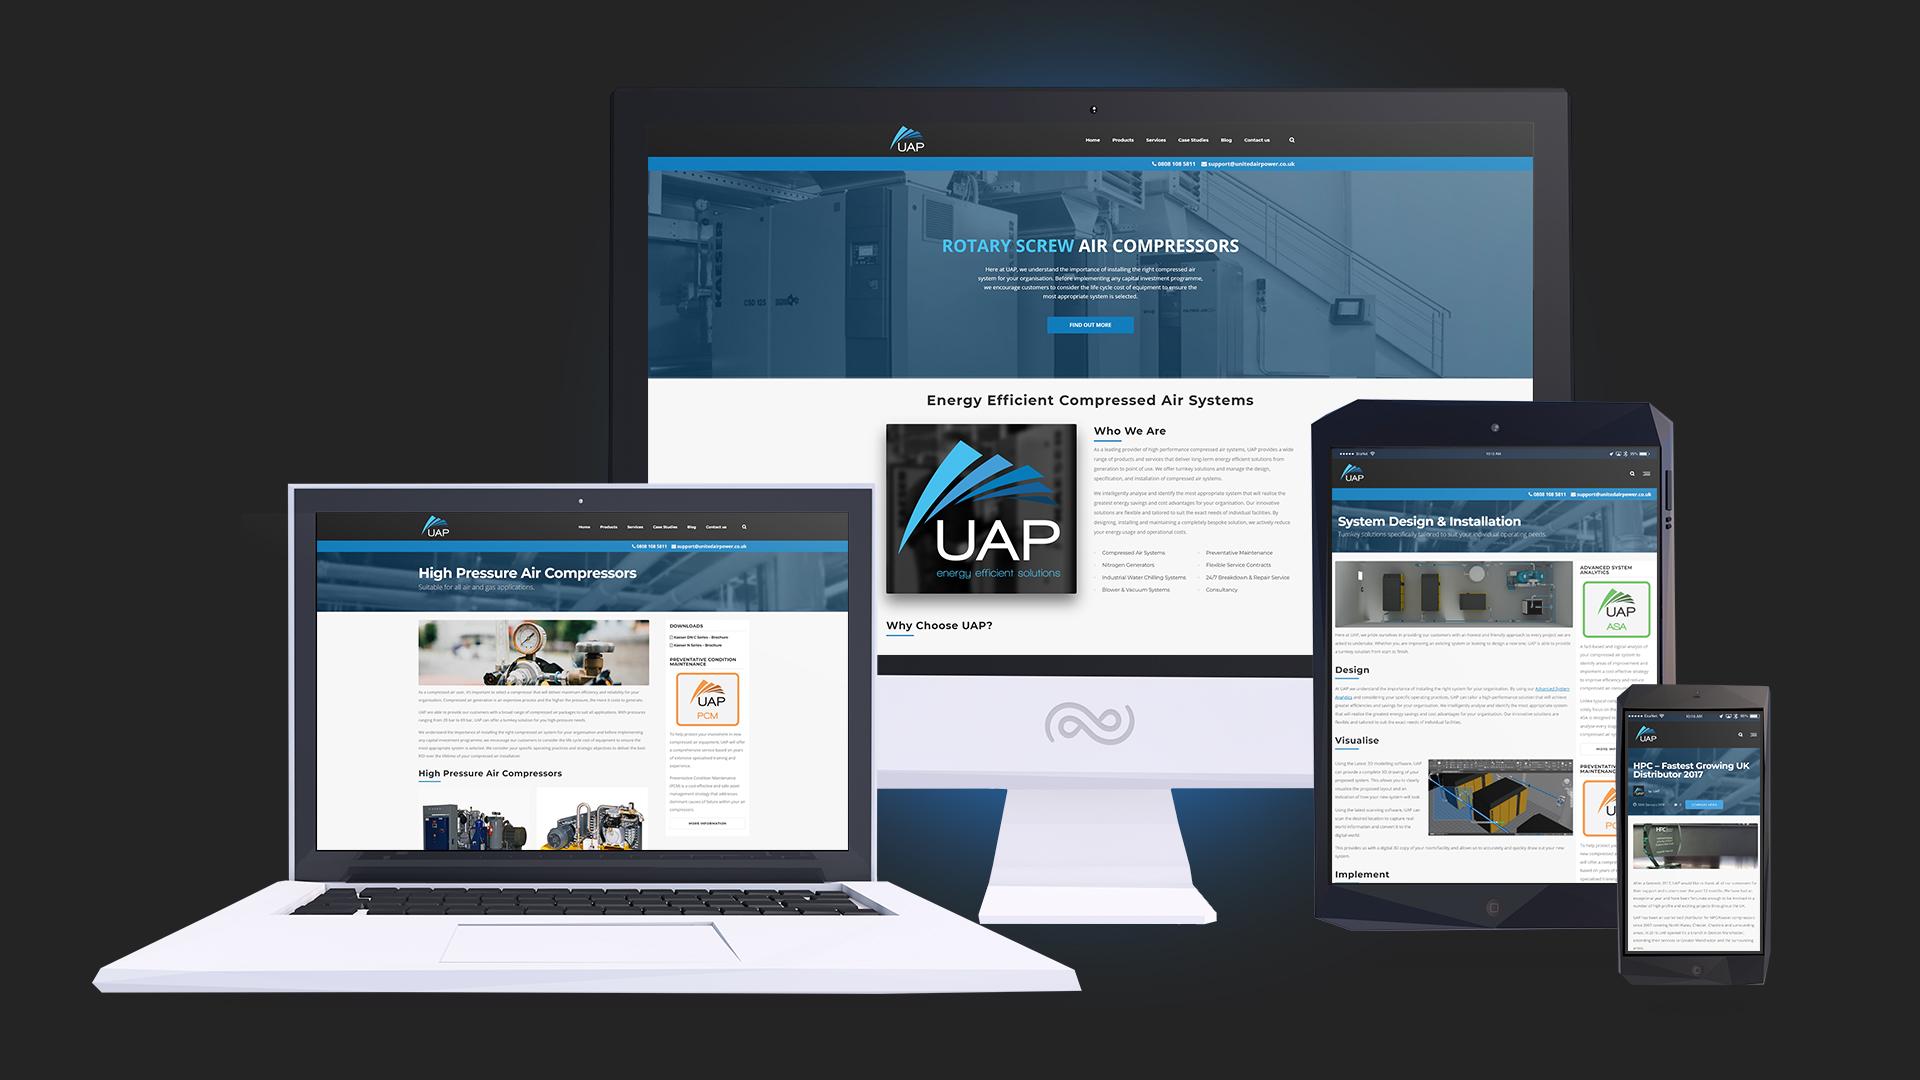 UAP's website redesign